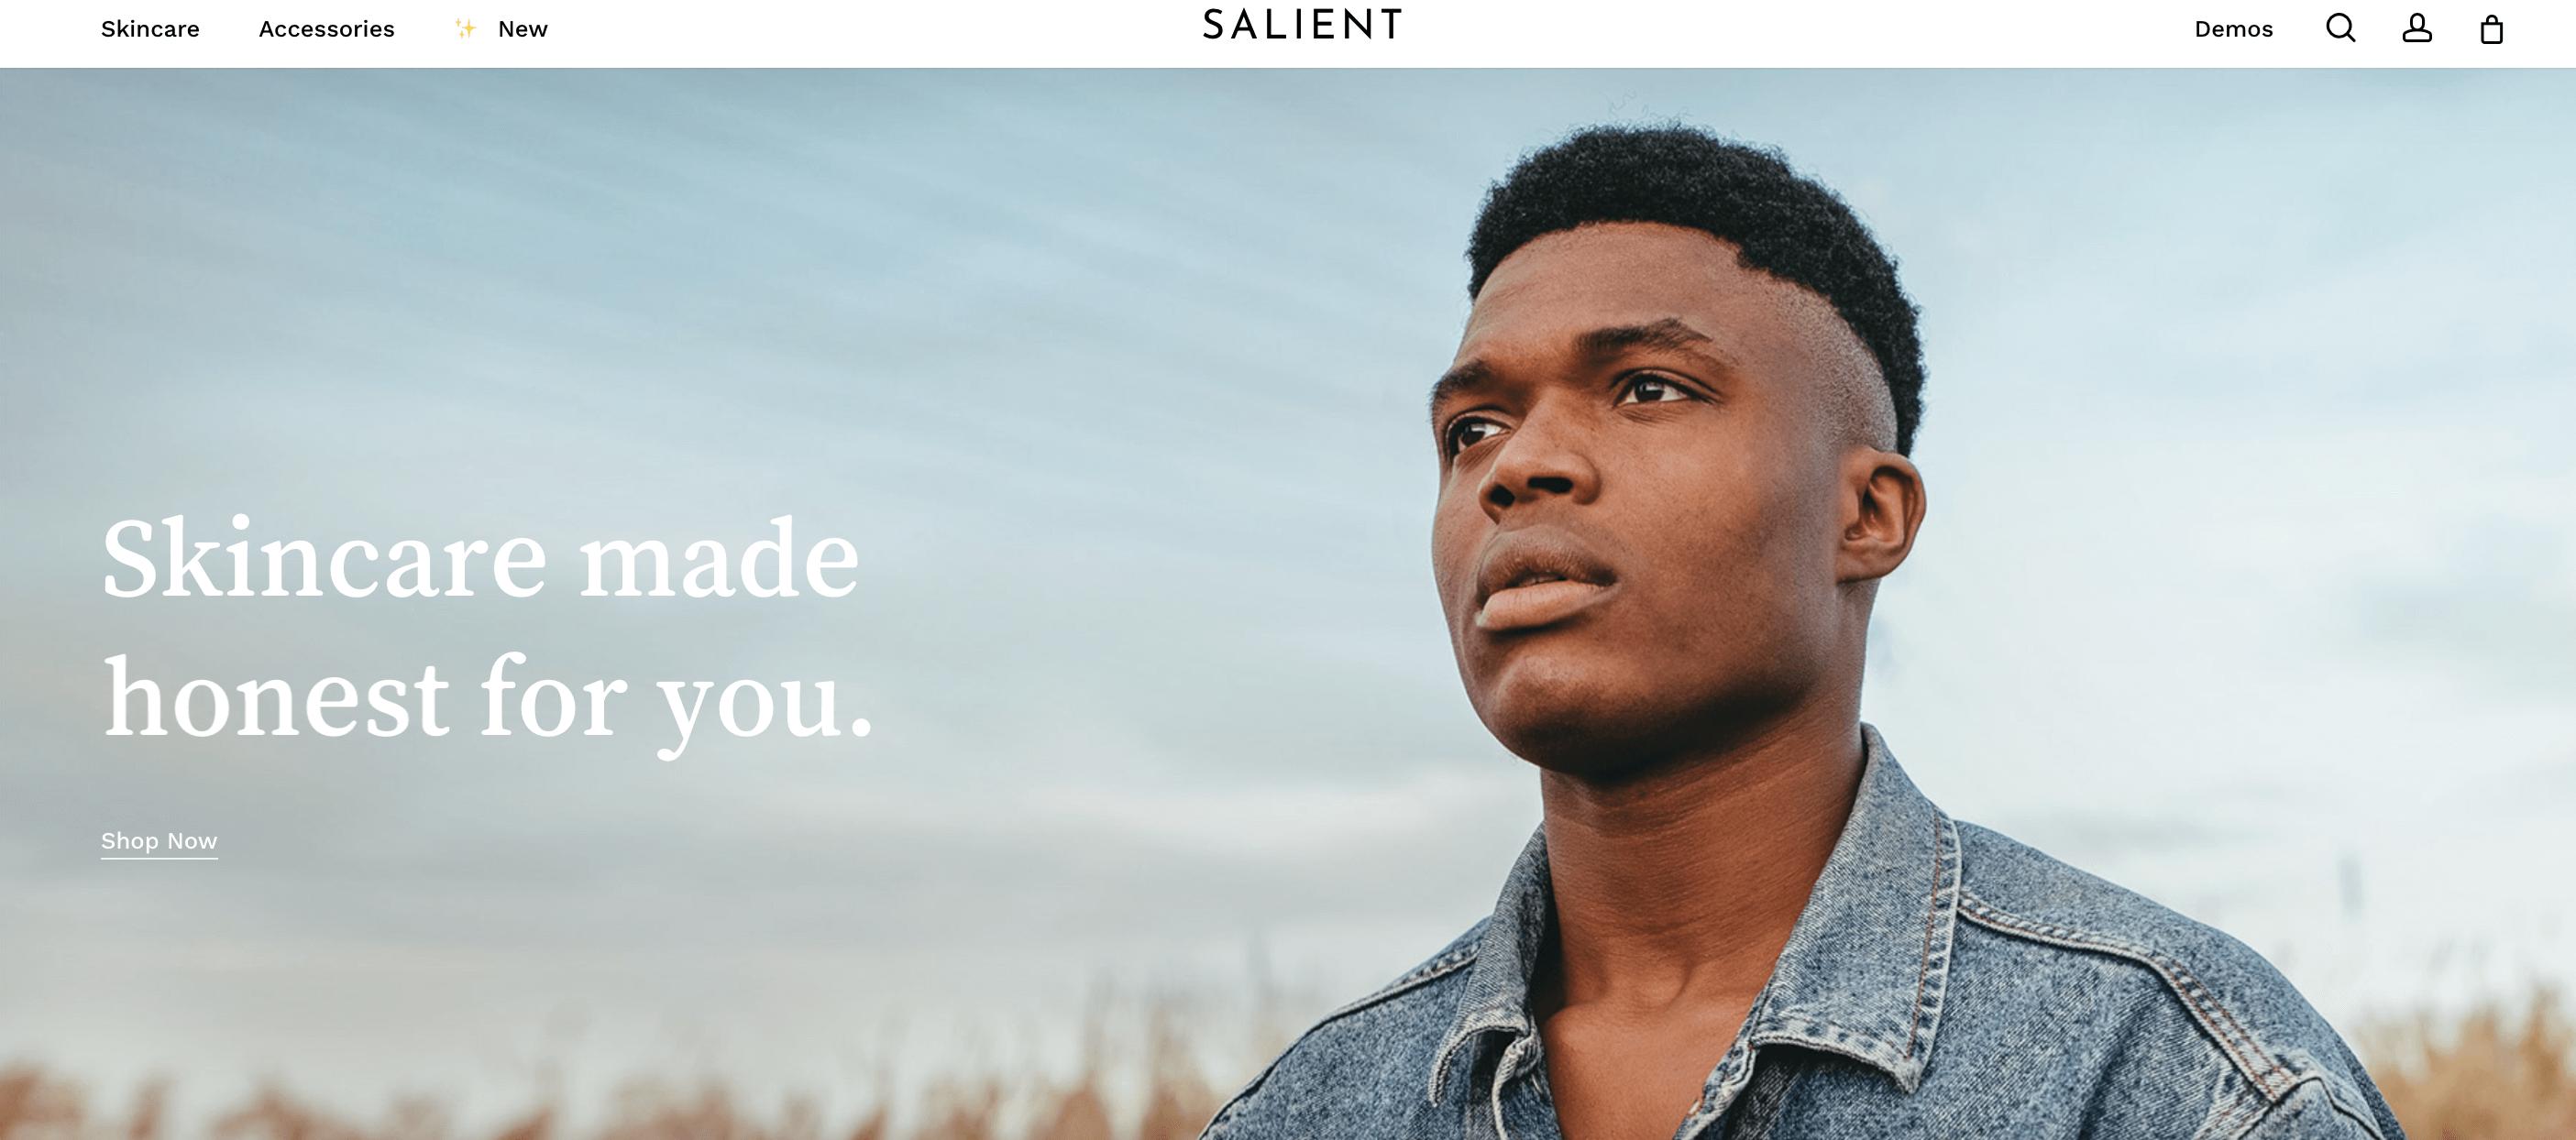 Salient HTML5 WordPress Theme